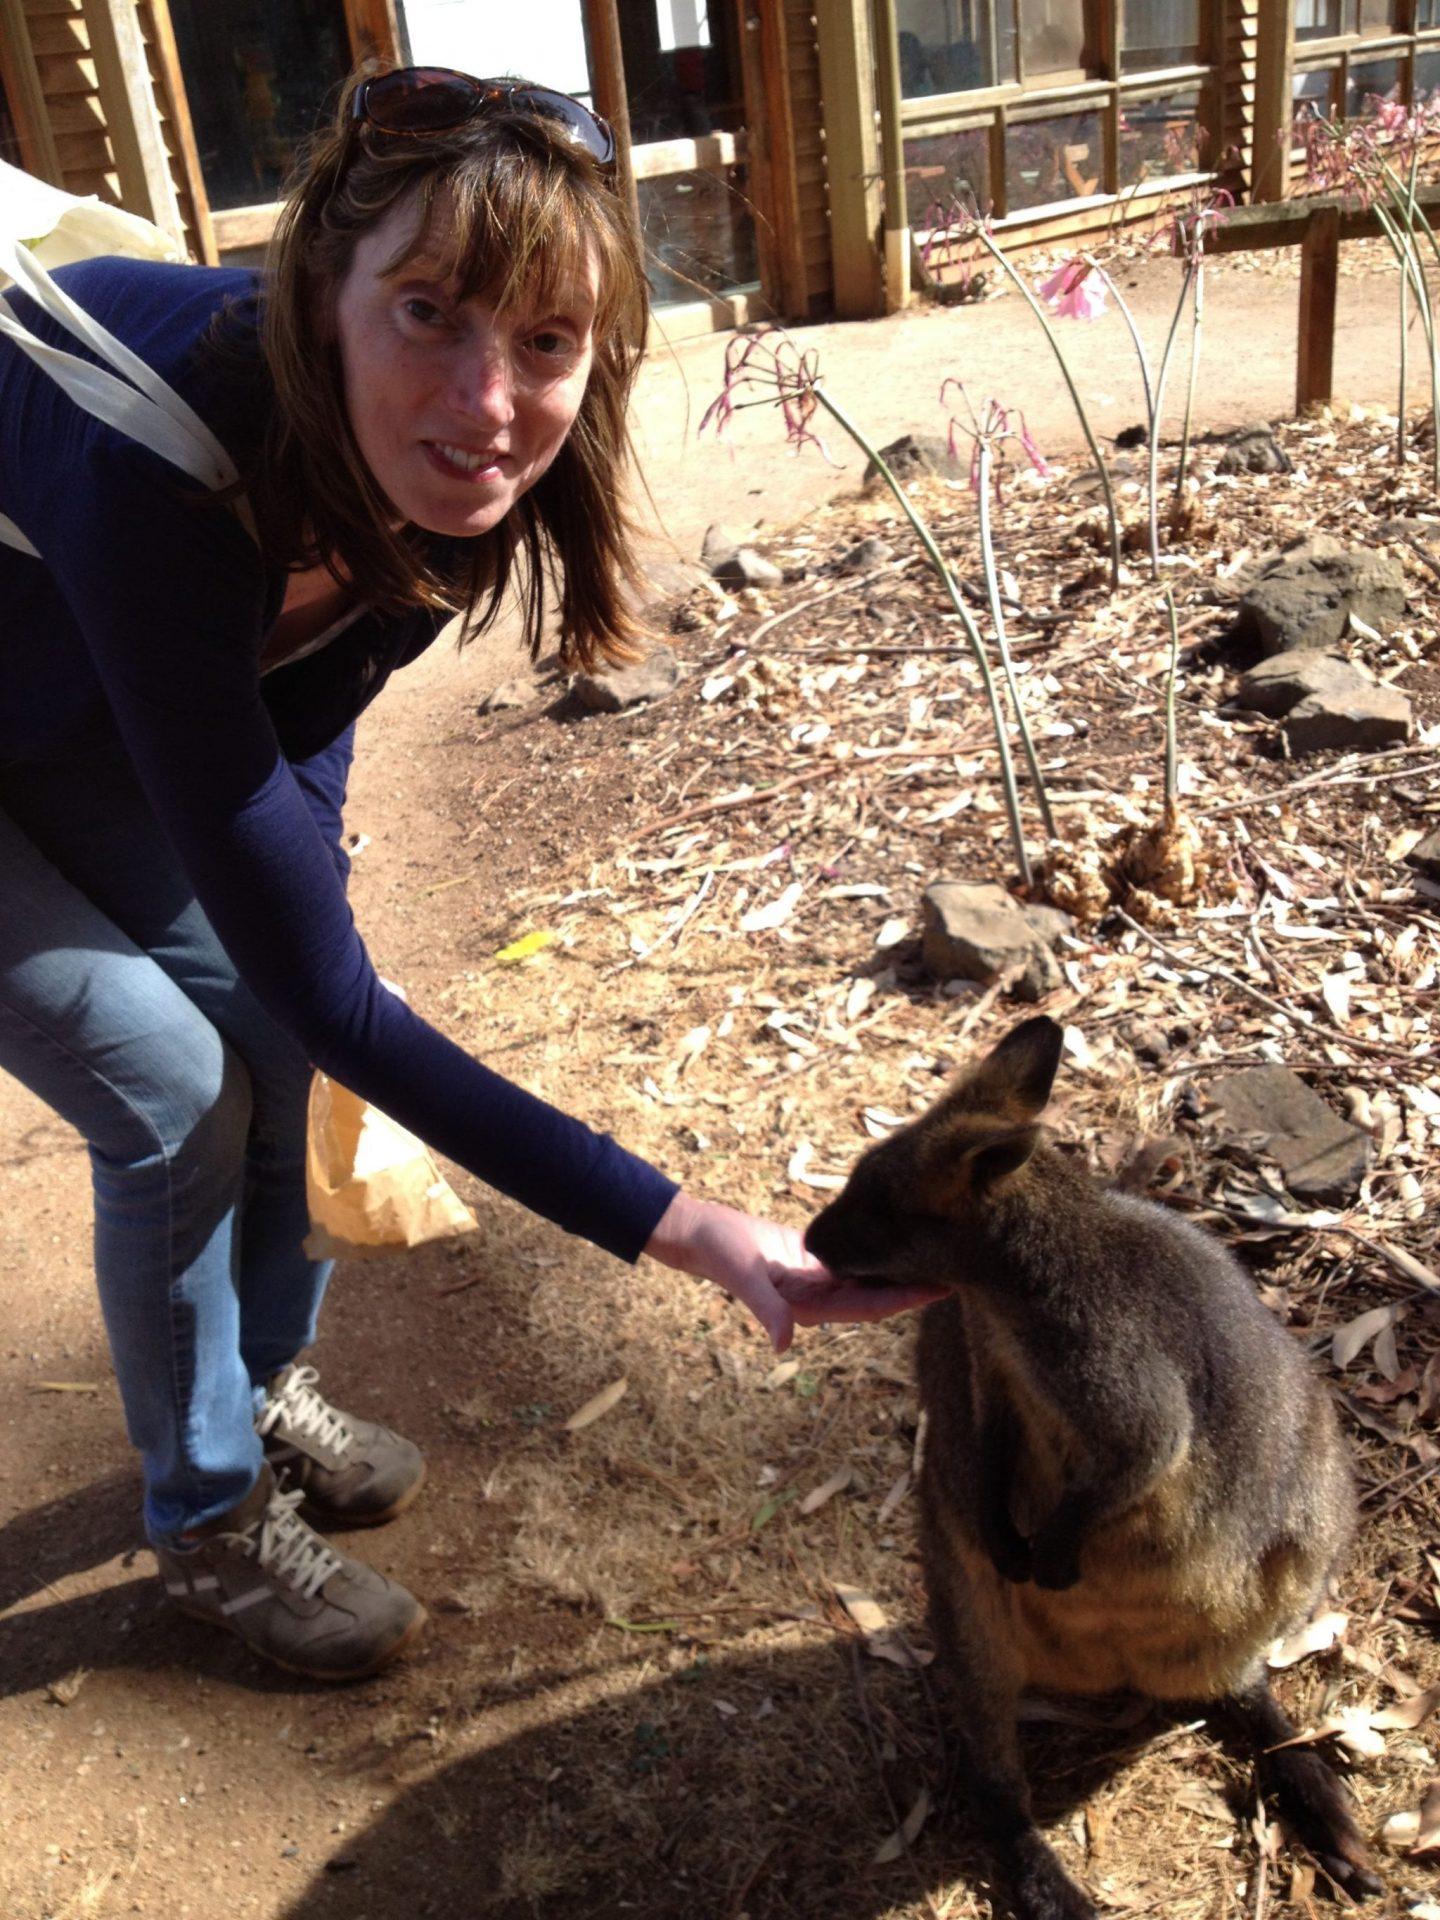 Feeding the wallabies at Phillip Island Wildlife Park